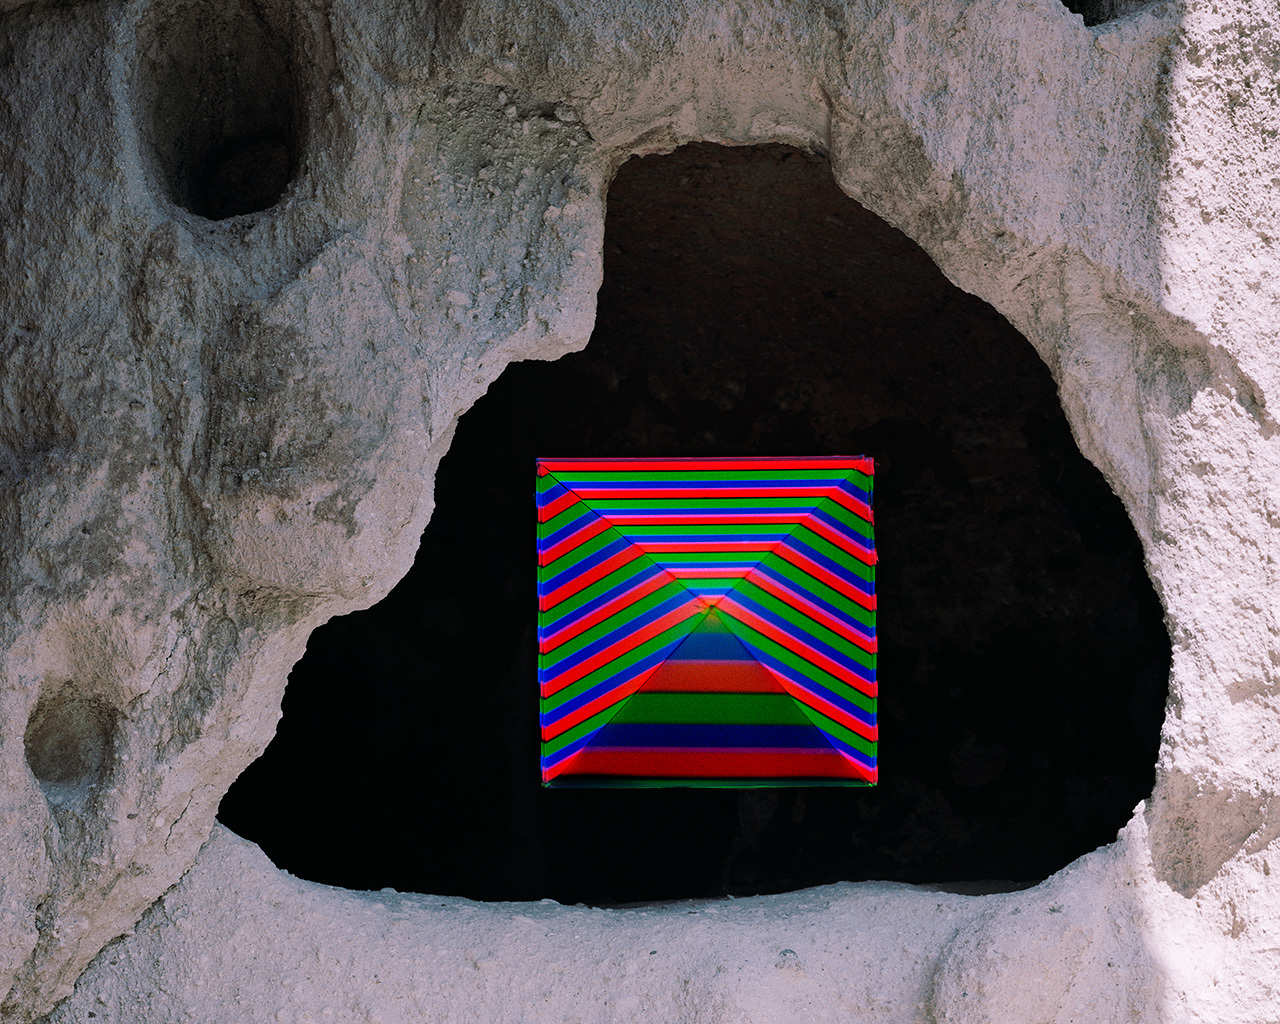 Lydia McCarthy     Dwelling (RGB),  2015 Archival Inkjet Print 8x10 in. 1 of 6